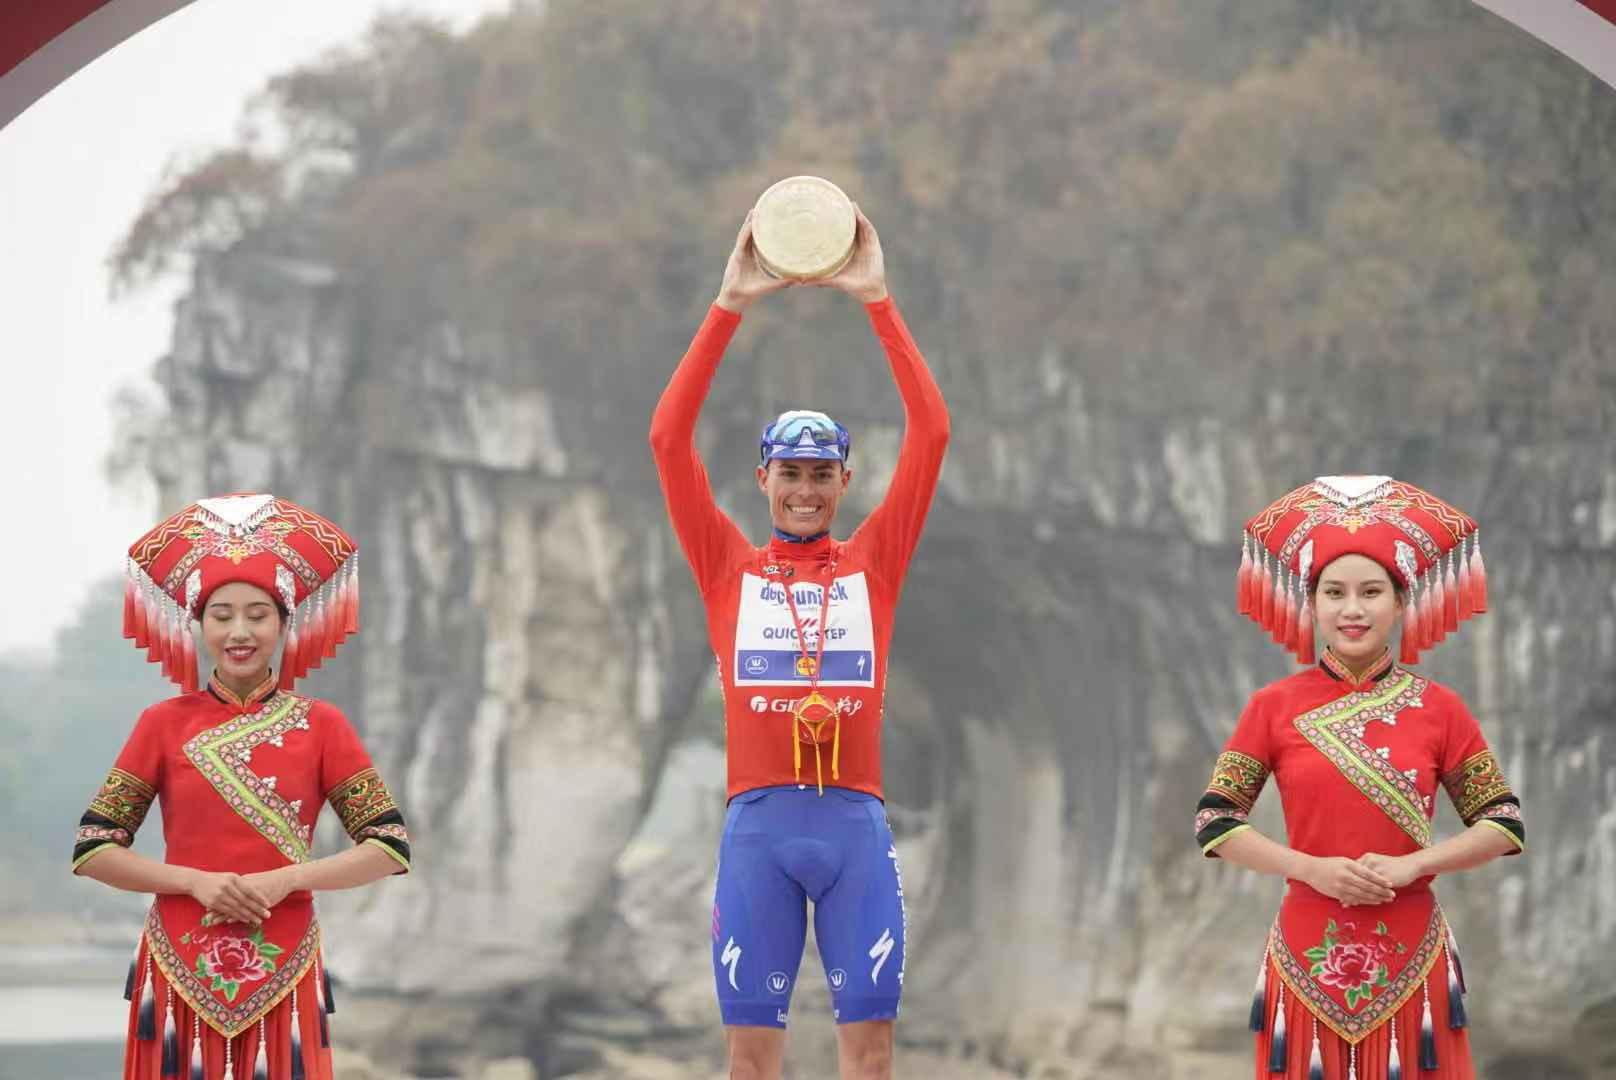 Mas bids farewell to Deceuninck-Quick-Step with Tour of Guangxi triumph